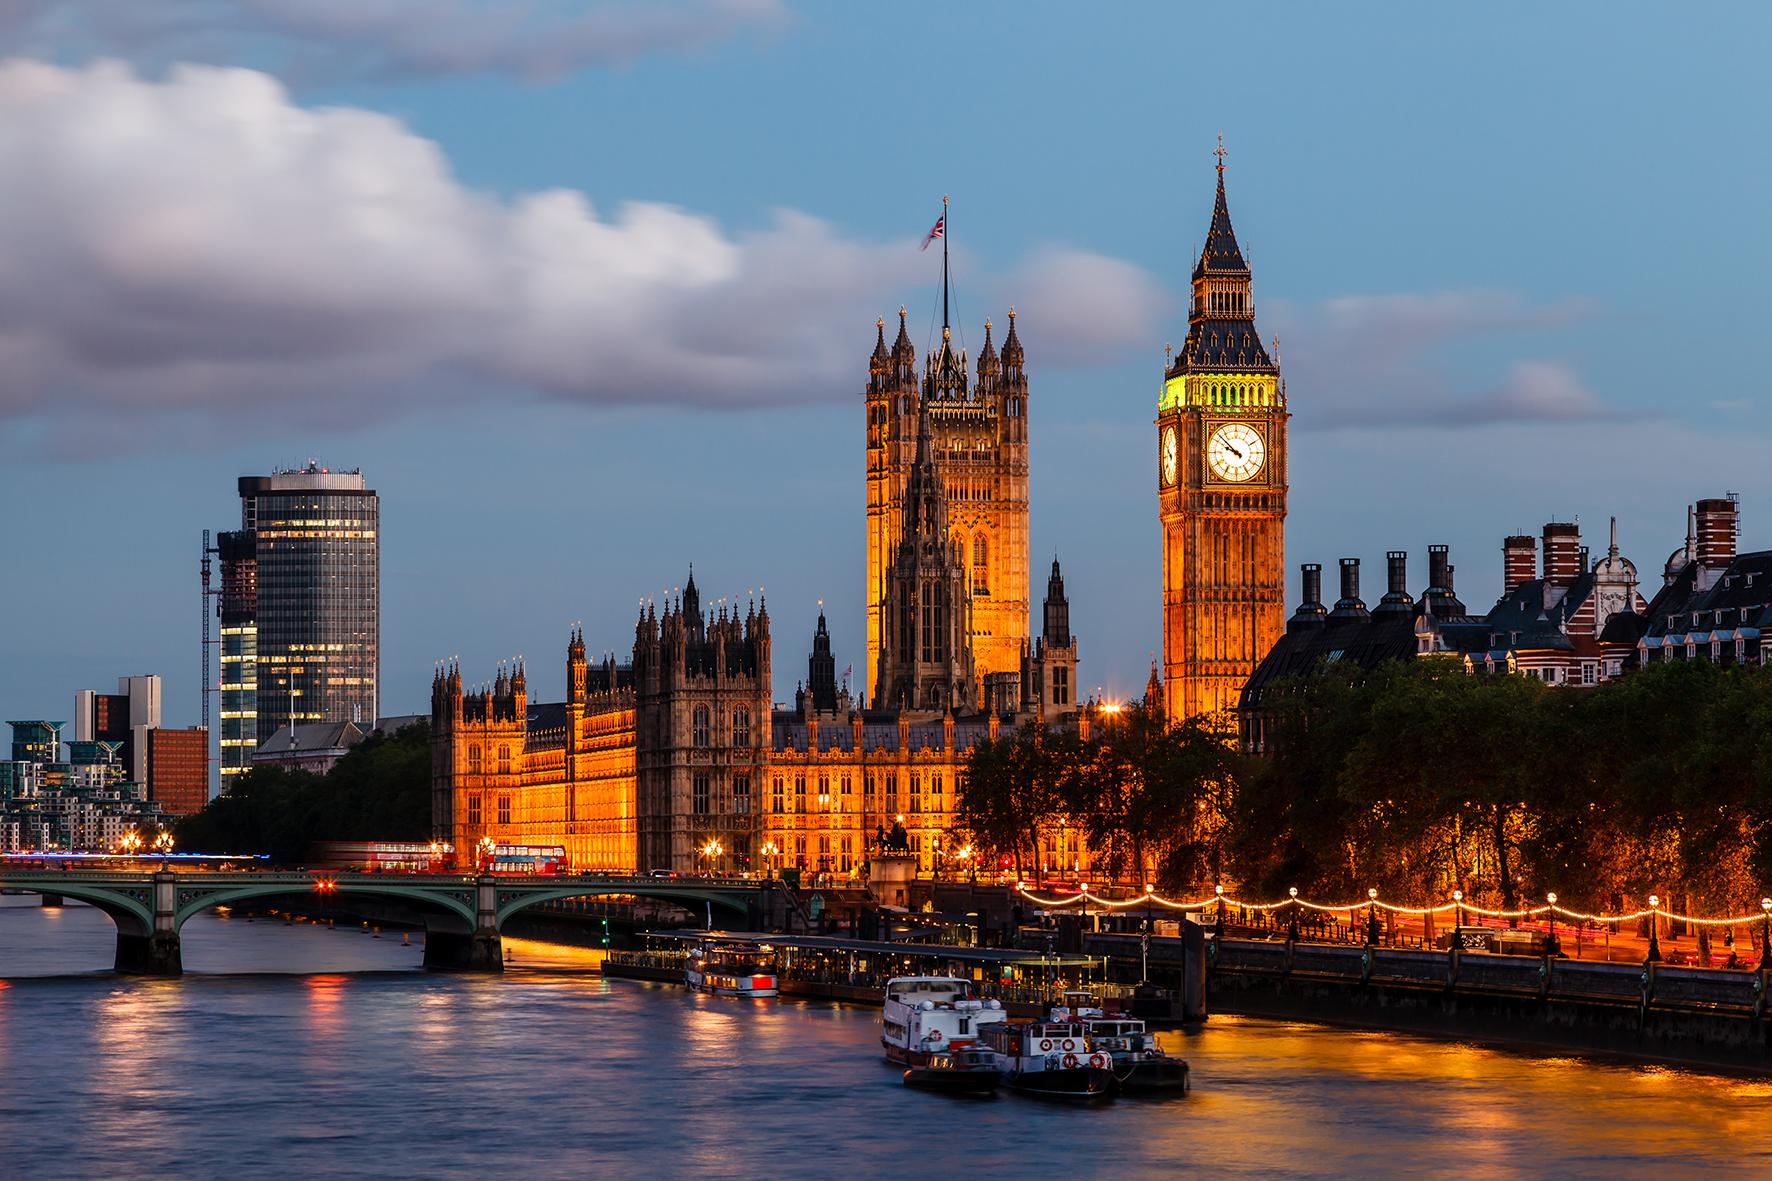 UK's parliament